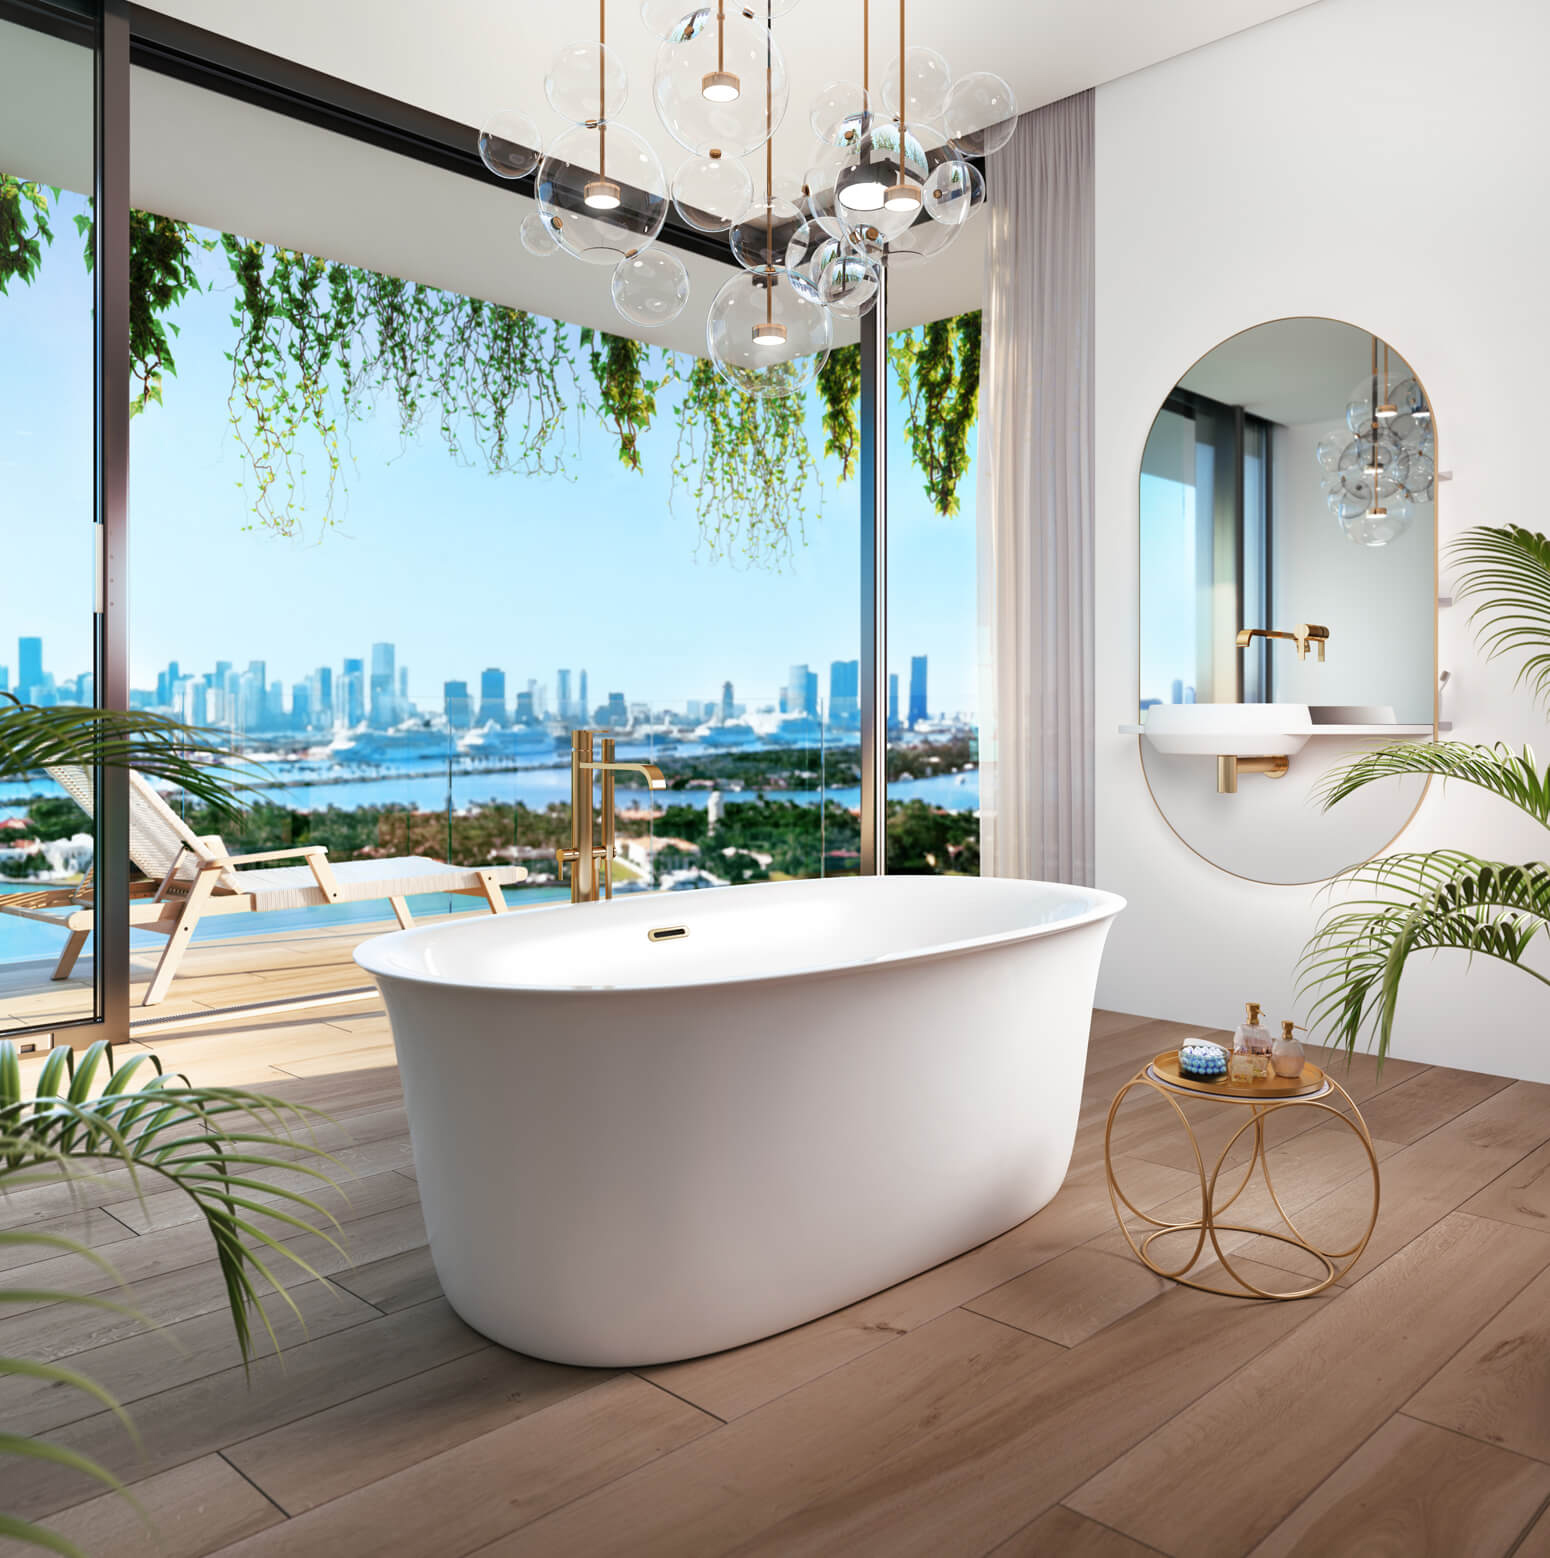 Bainultra Vibe Design 6033 freestanding air jet bathtub for your modern bathroom